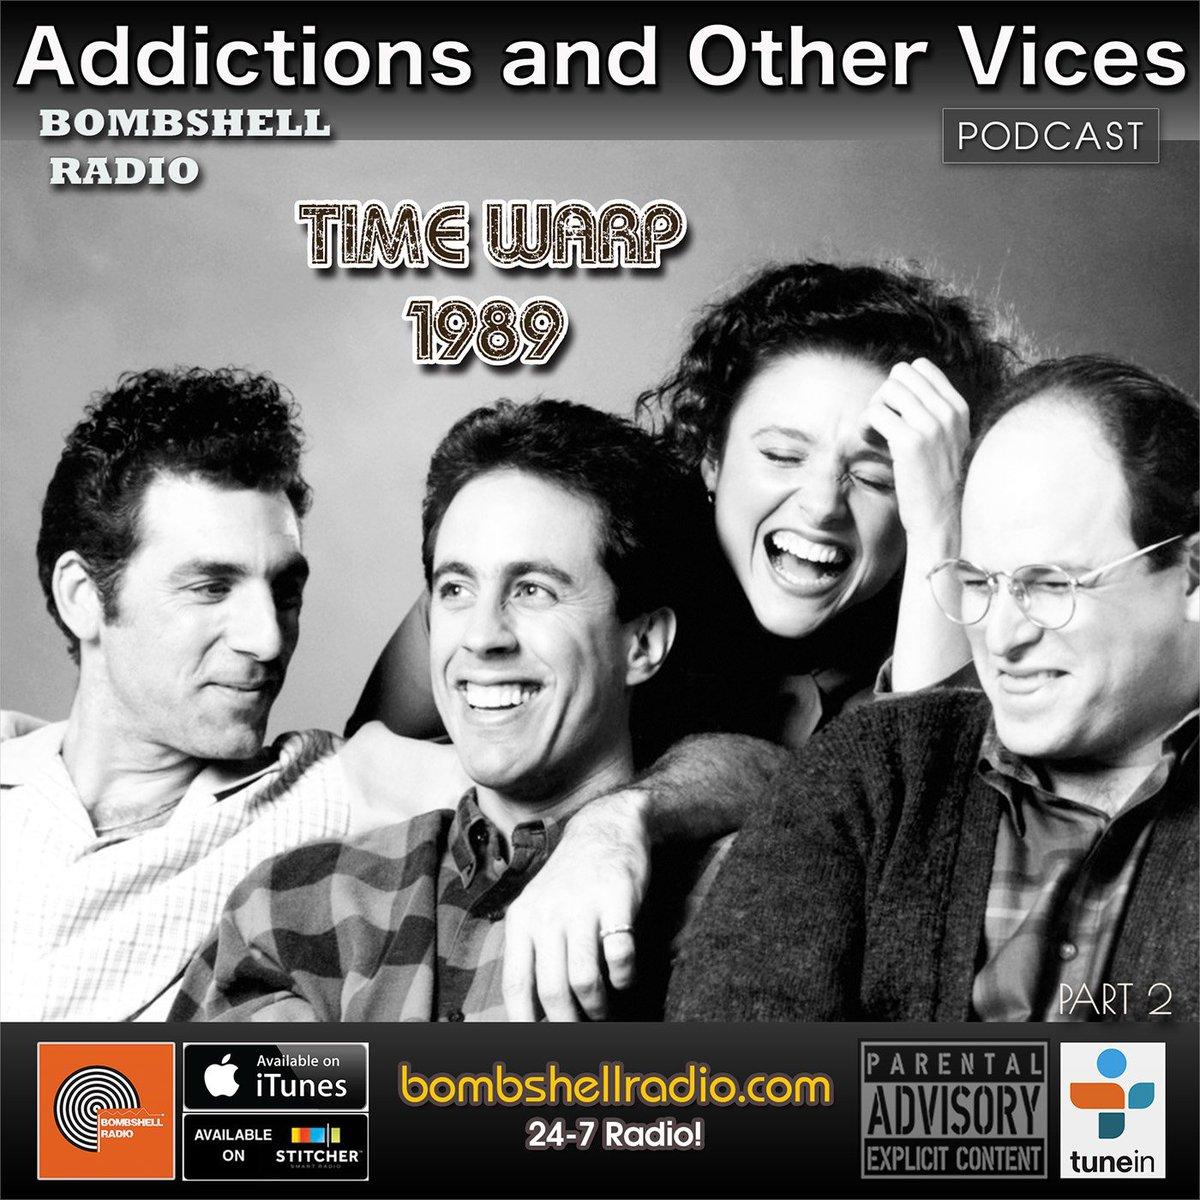 Join us http://bombshellradio.com   24-7 #Rock,  #Classics, #AddictionsPodcast, #Timewarp, #NewWave, #Pop ,#80s ,#Radio, #ClassicRock ,#BombshellRadio @AddictionsDJ